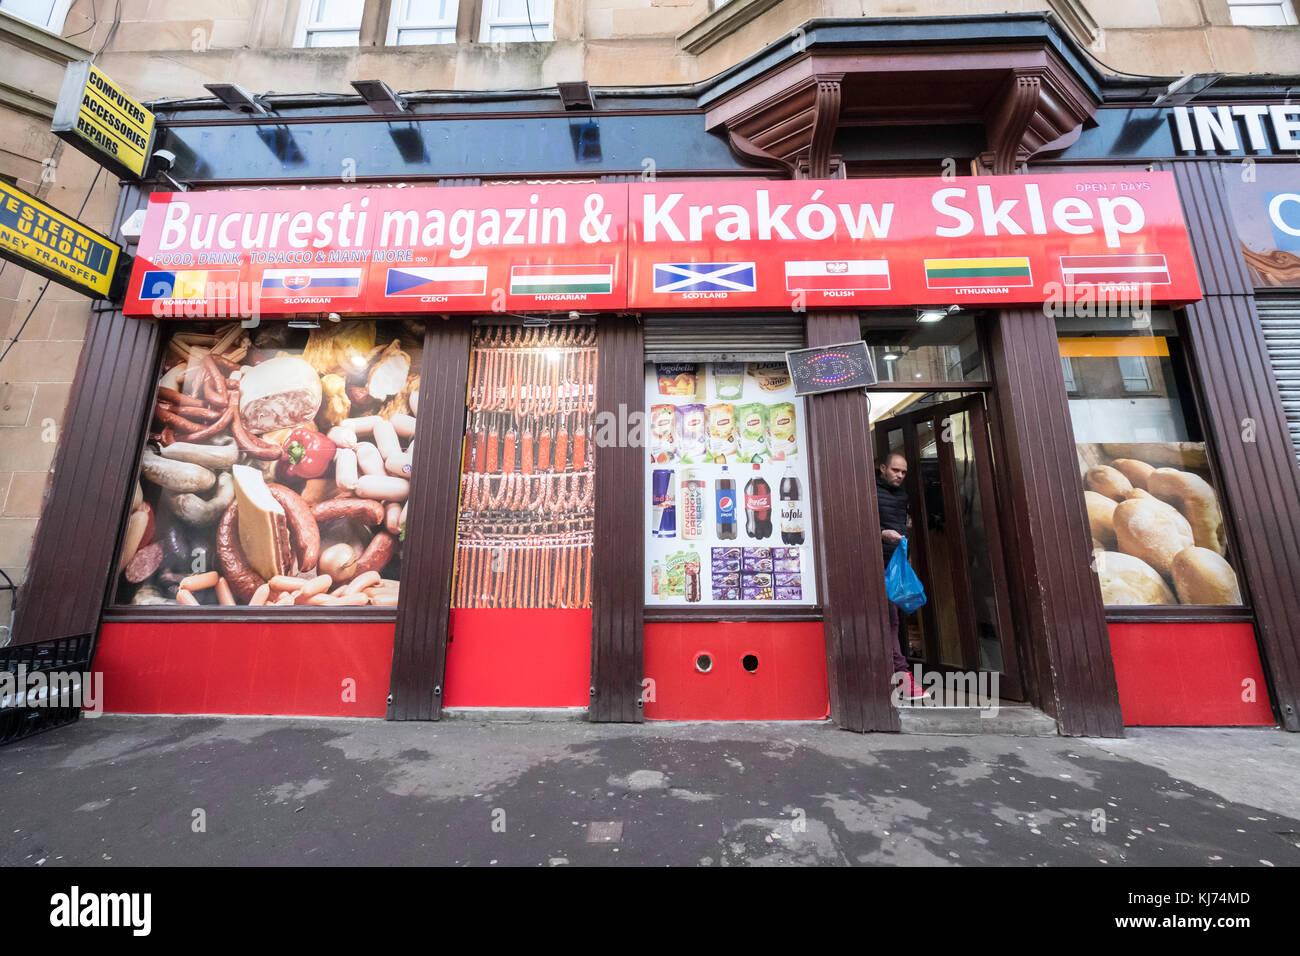 Romanian Food Online Store Uk